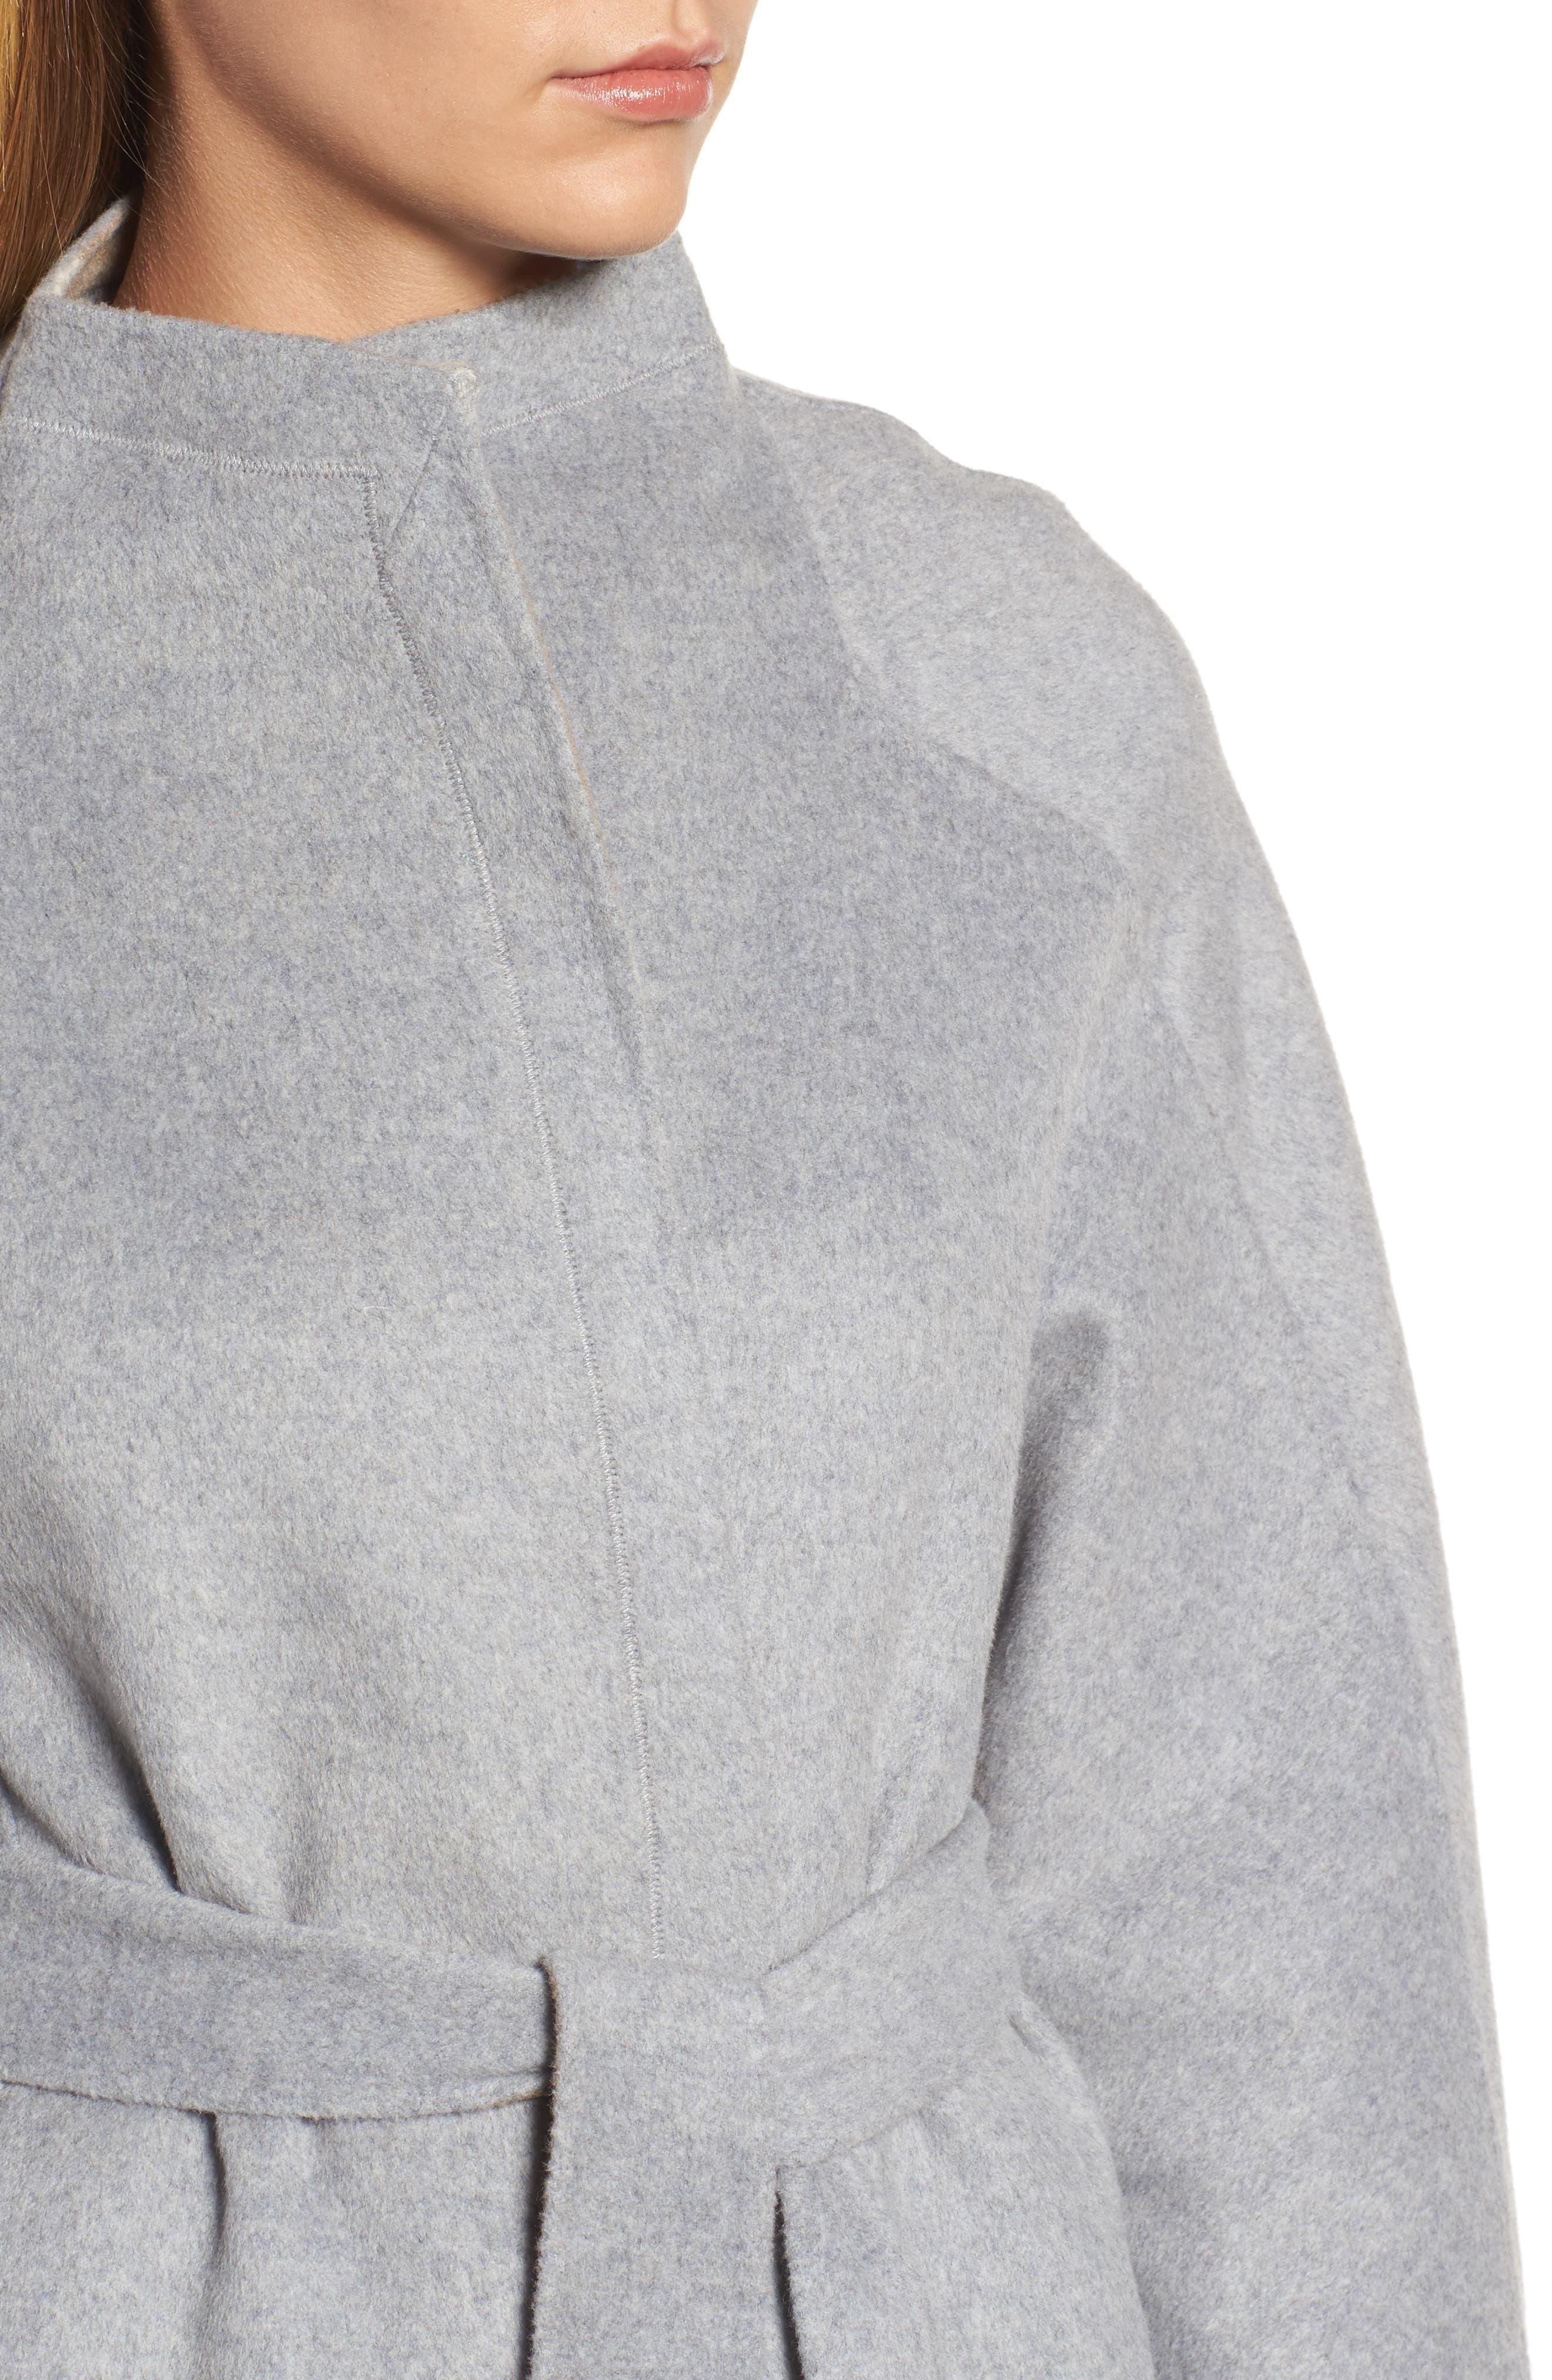 DKNY Wool Blend Wrap Coat,                             Alternate thumbnail 4, color,